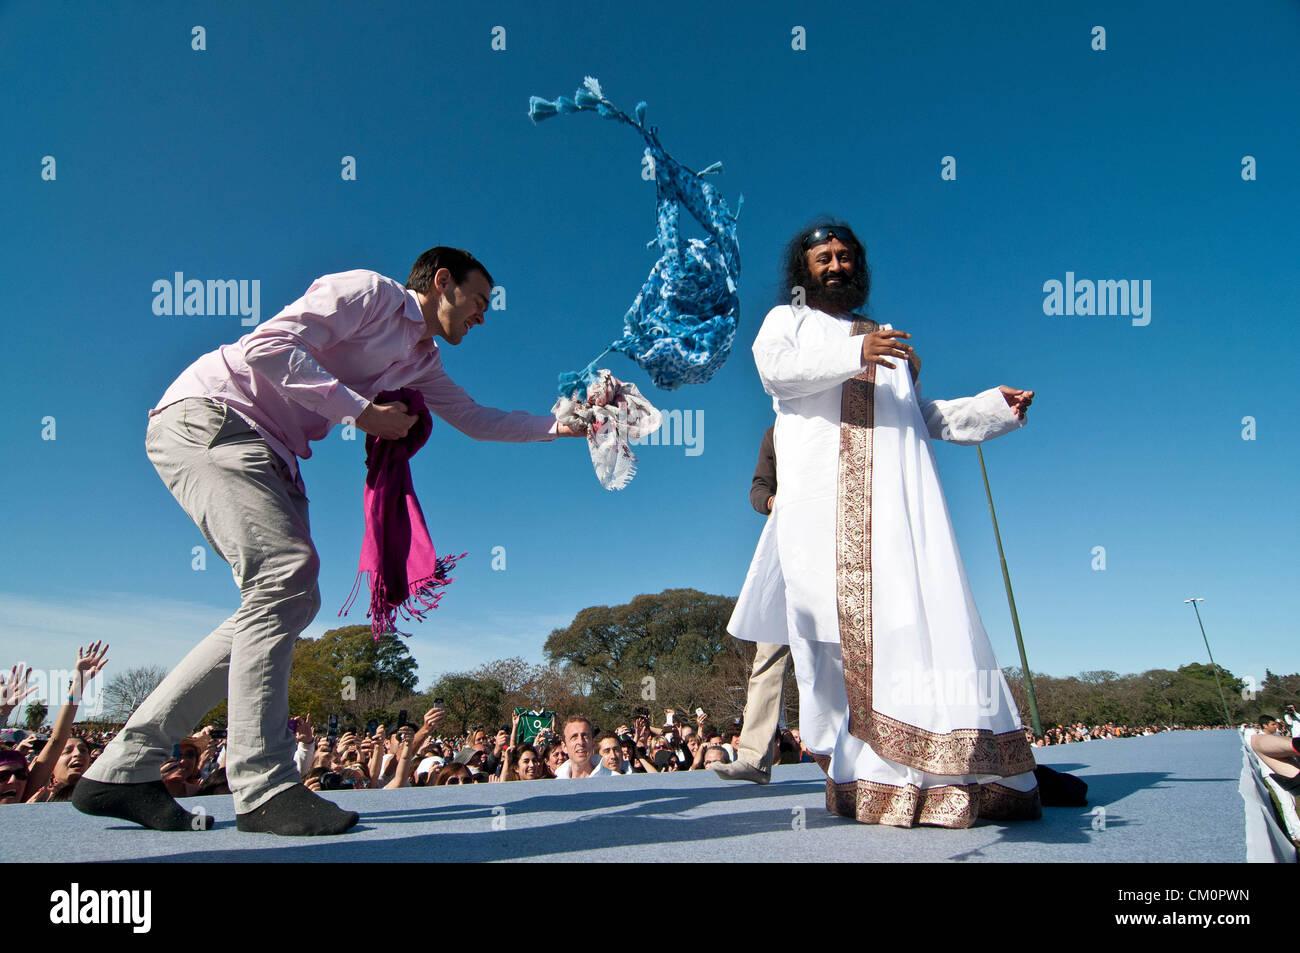 9 septembre 2012 - Buenos Aires, Argentine - guru indien Sri Sri Ravi Shankar, chef de l'ONG L'Art de Vivre, Photo Stock